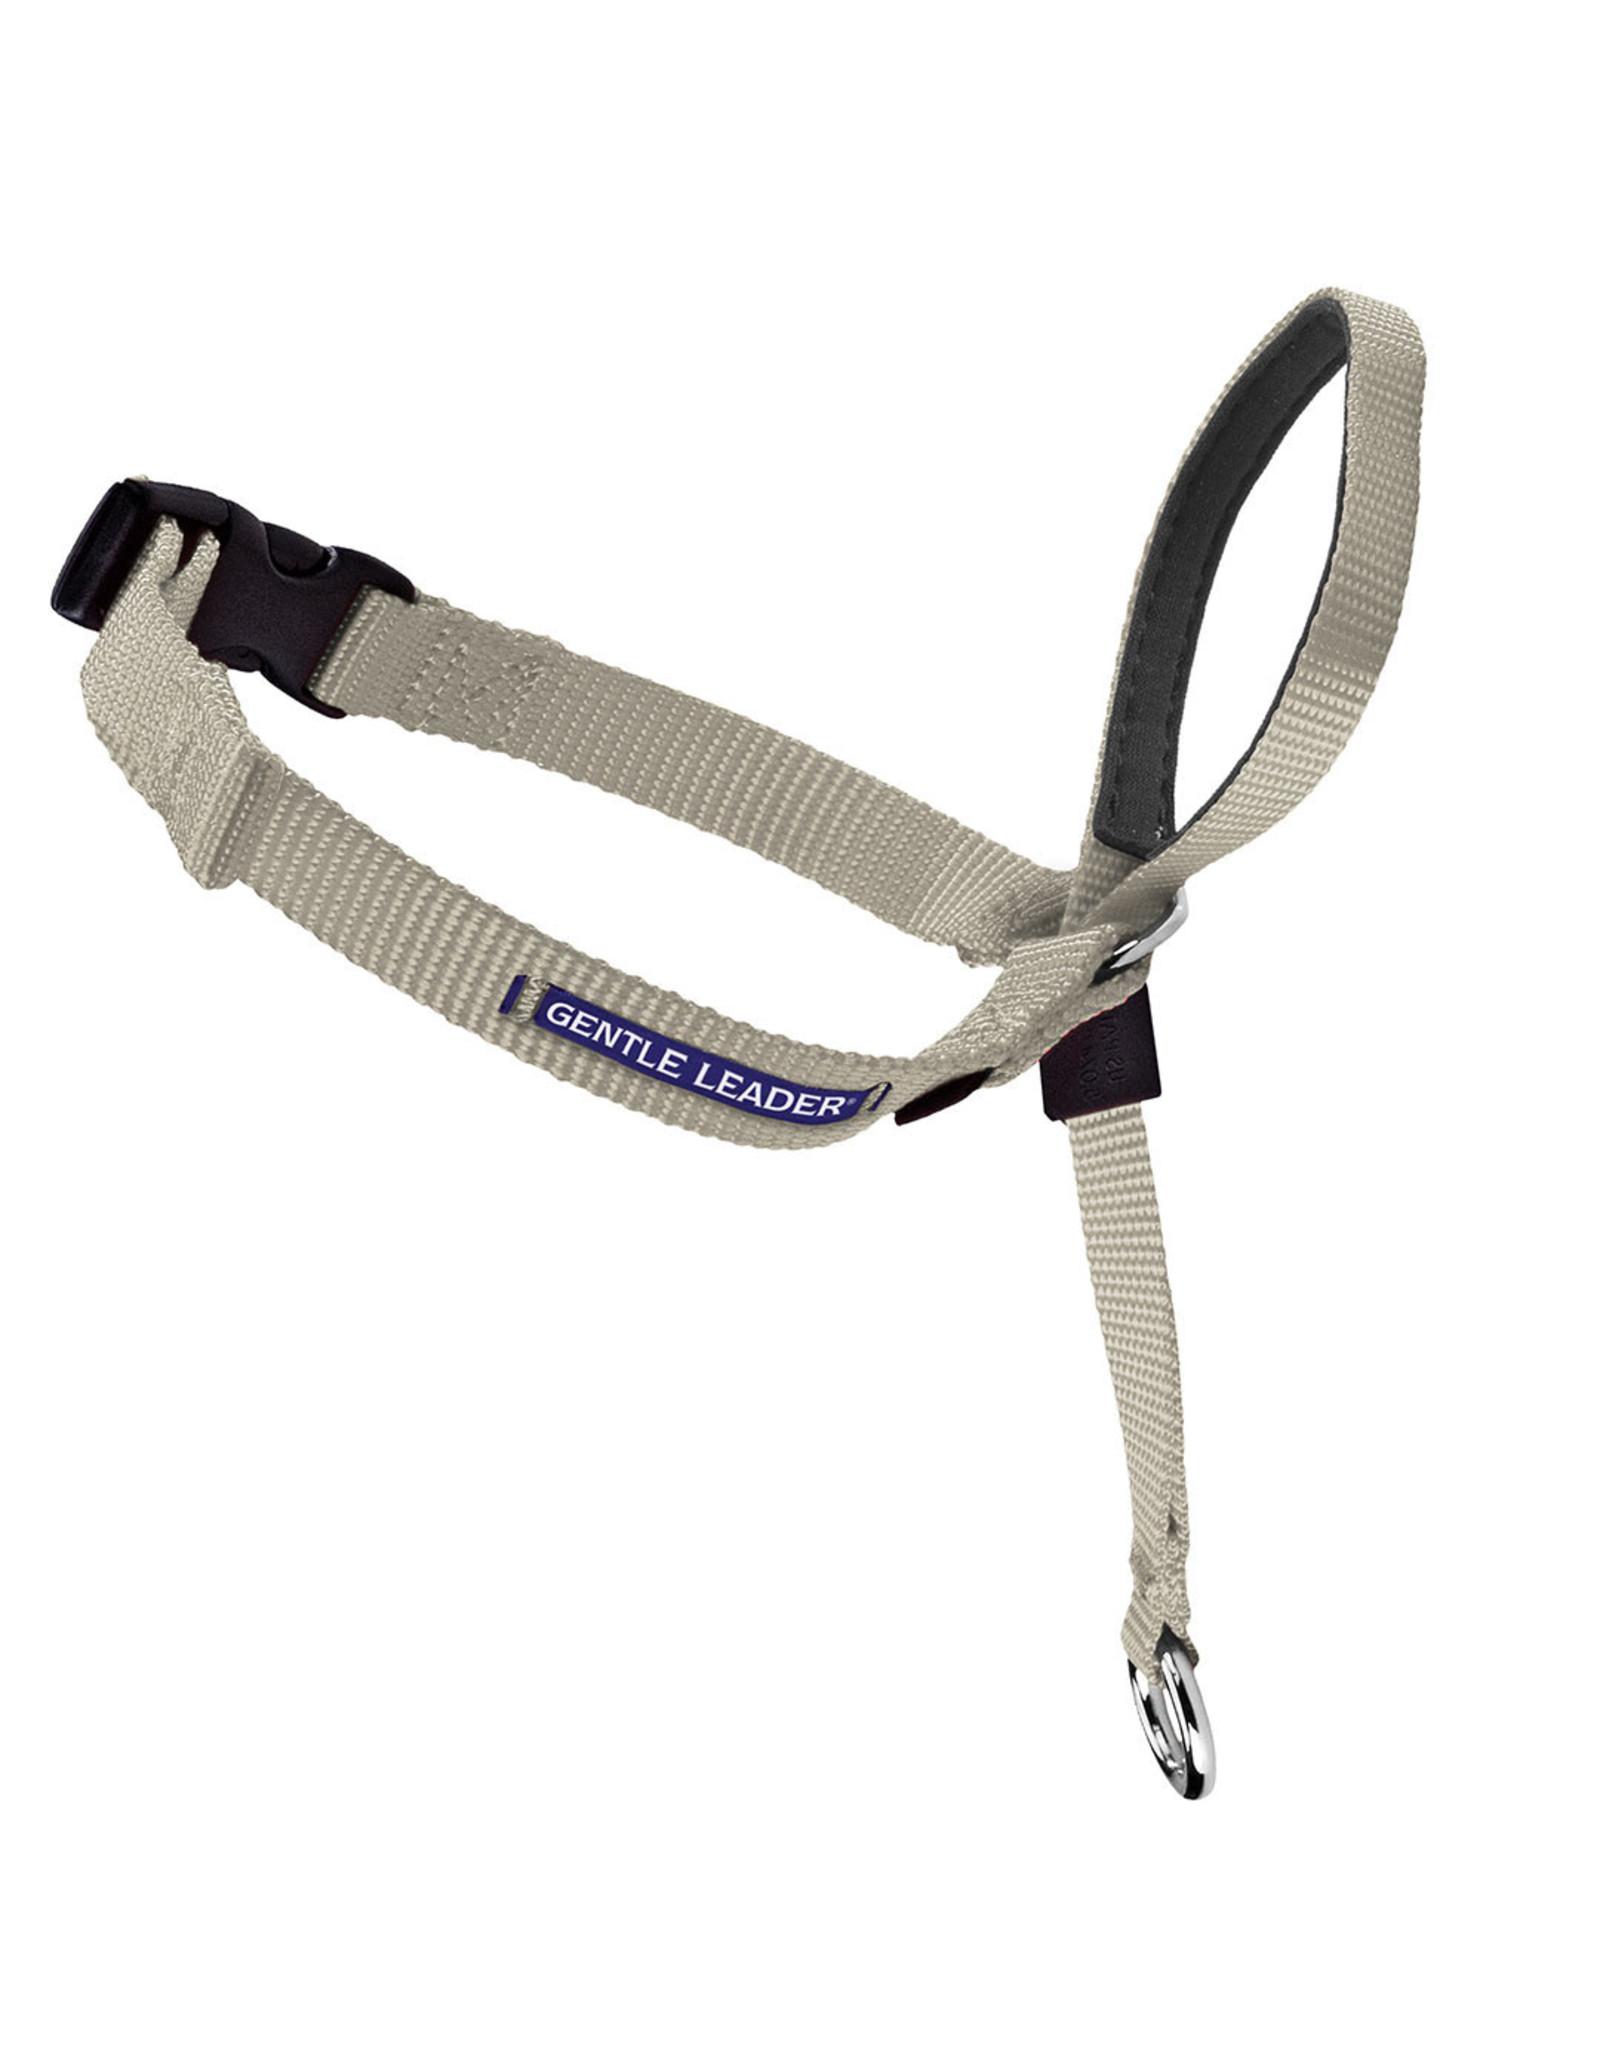 PetSafe PetSafe Gentle Leader Dog Head Collar Harness